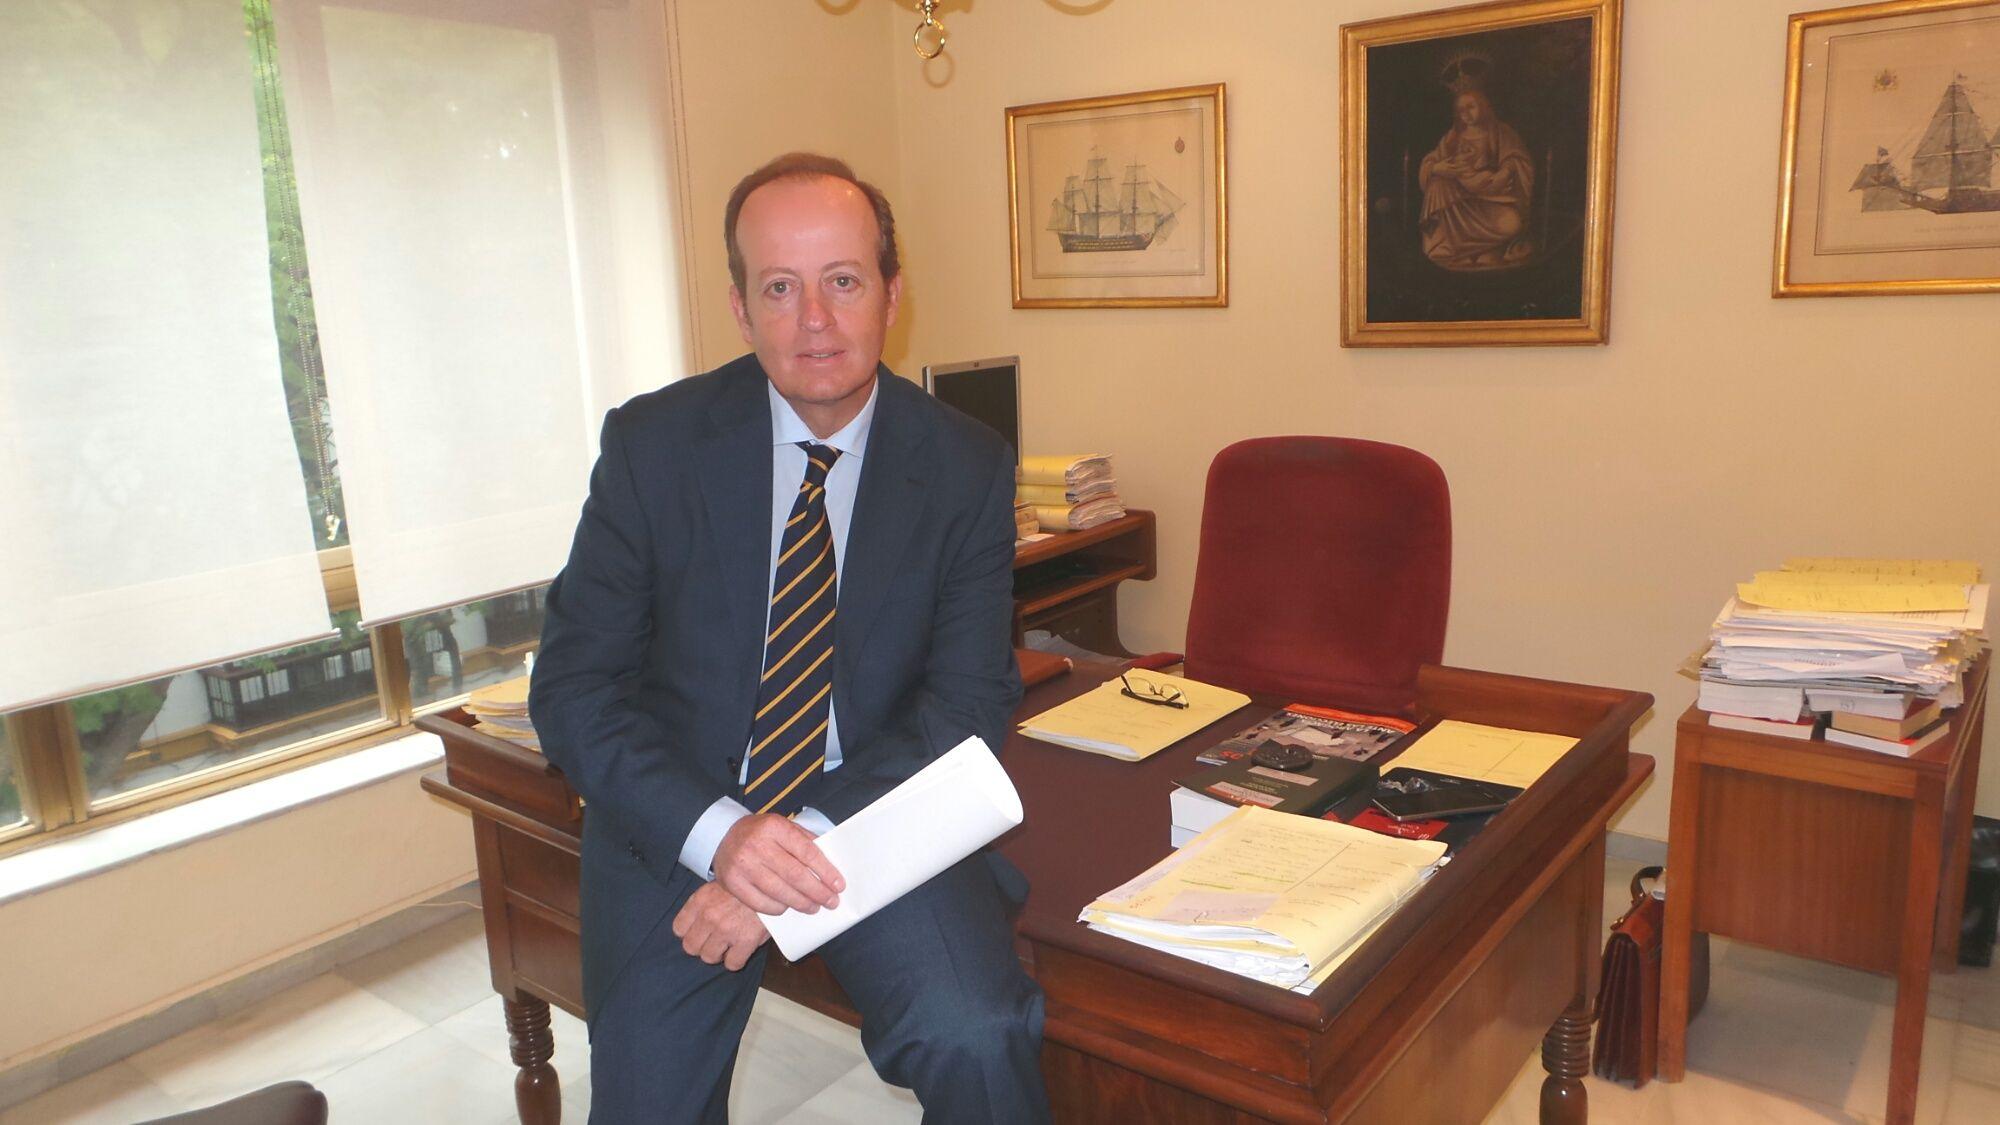 Marcos Camacho